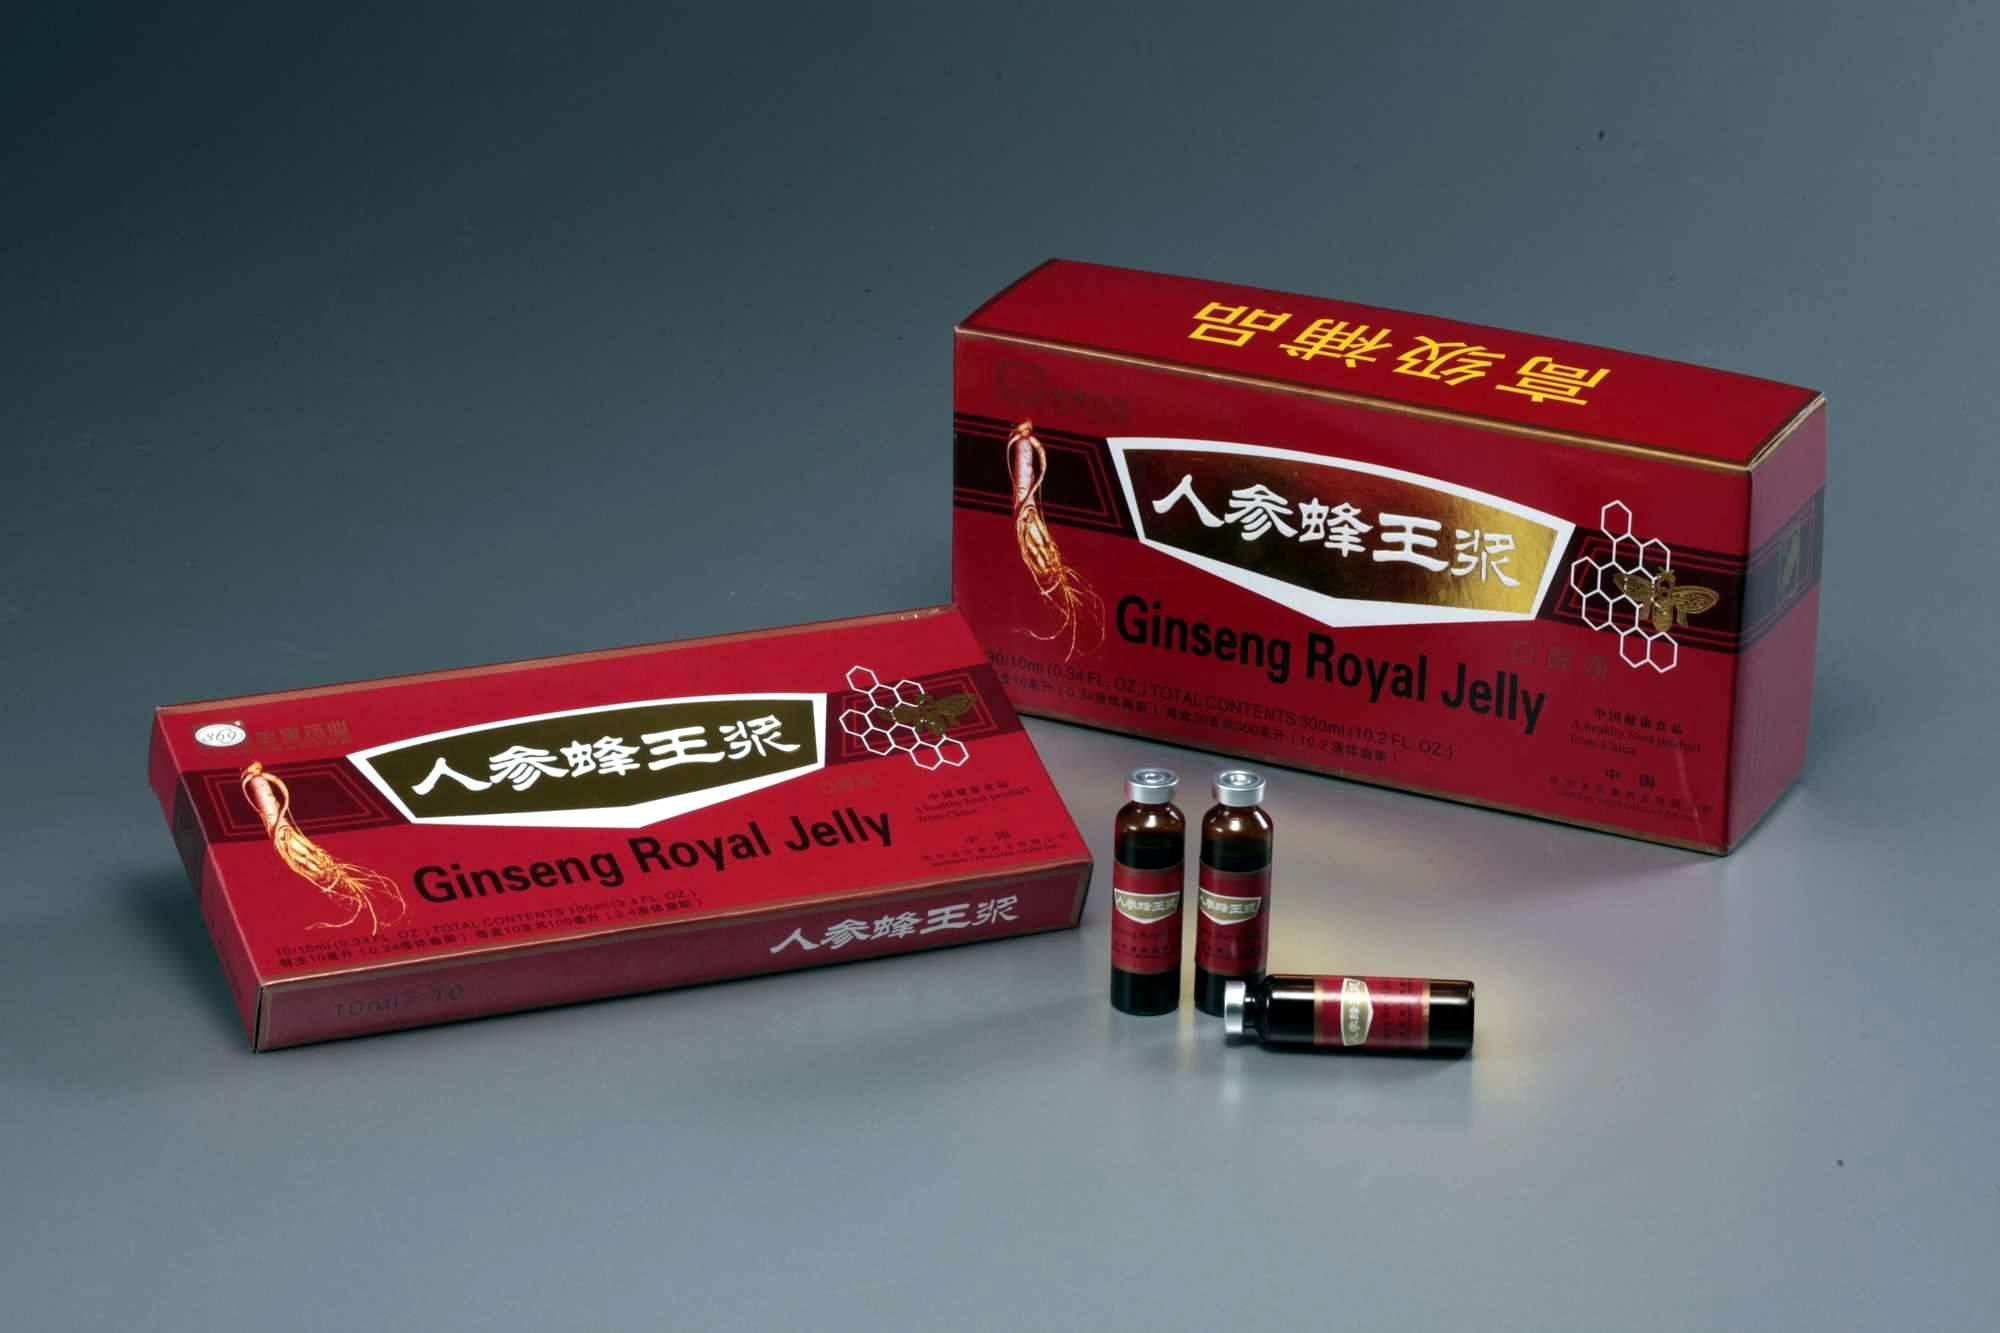 Halal Ginseng Royal Jelly 10ml Oral Drink